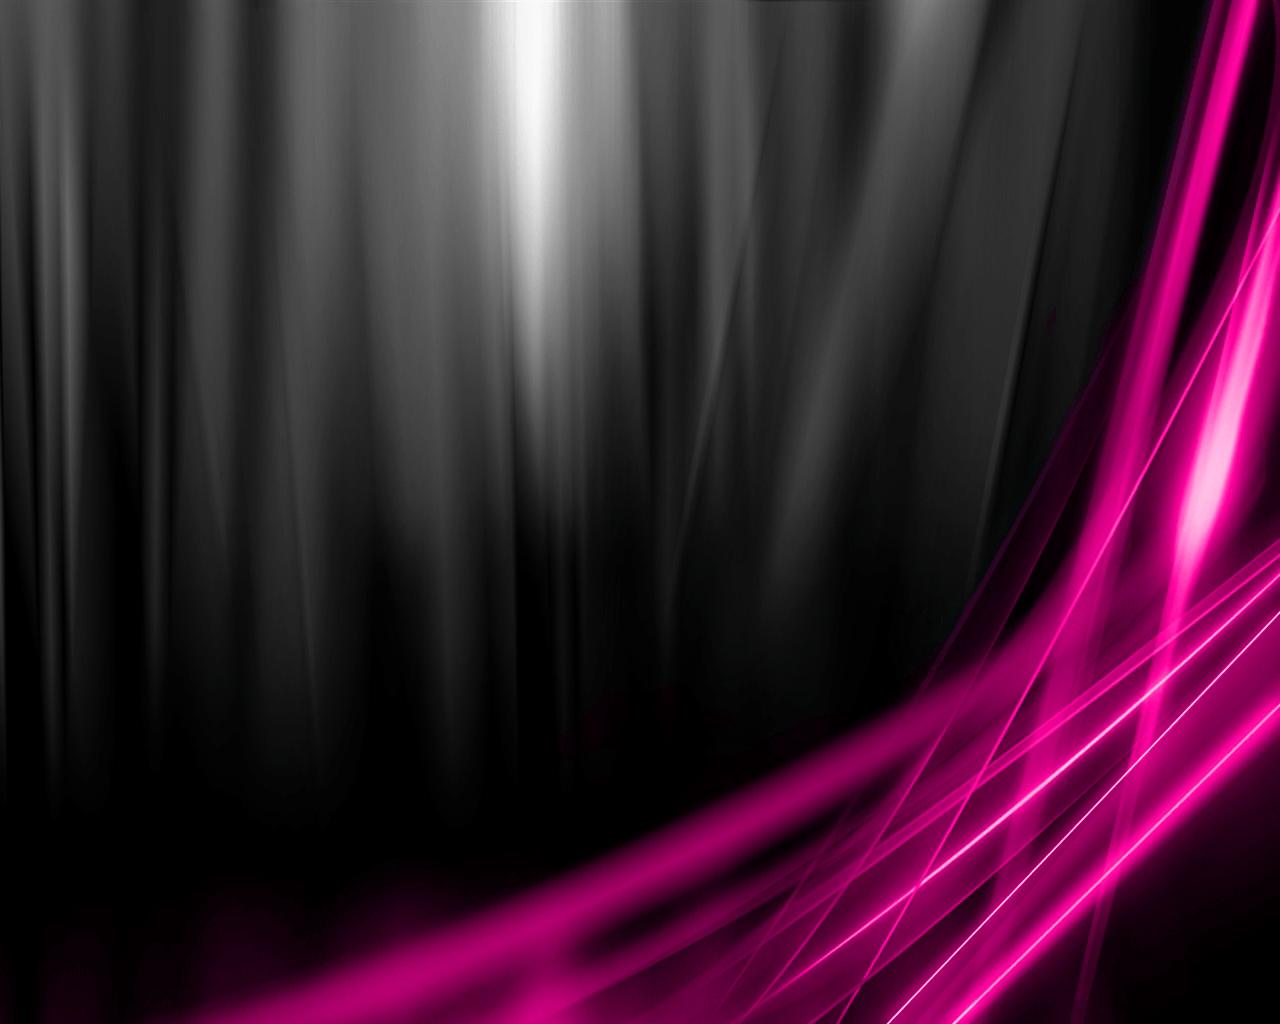 Wallpapers Pink Black - Wallpaper Cave